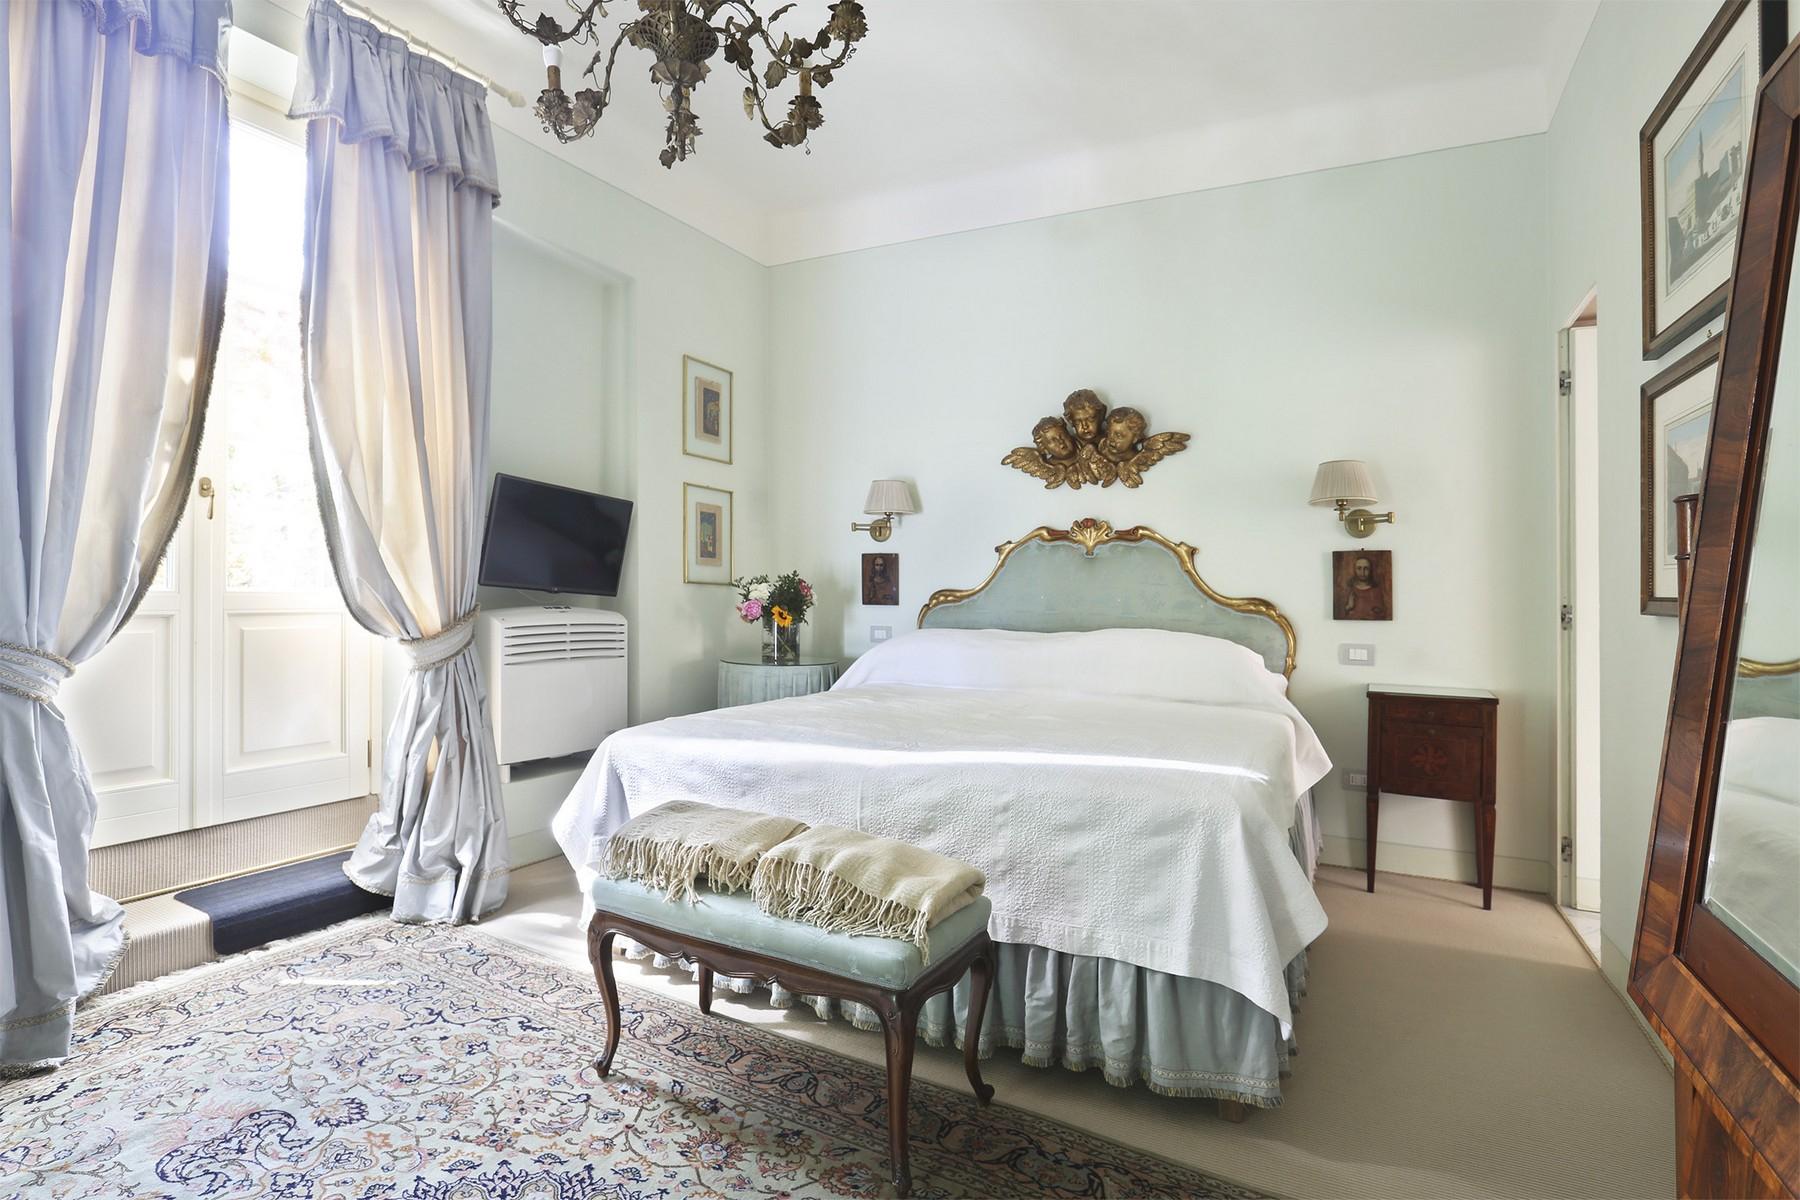 Villa in Vendita a Lucca: 5 locali, 735 mq - Foto 18